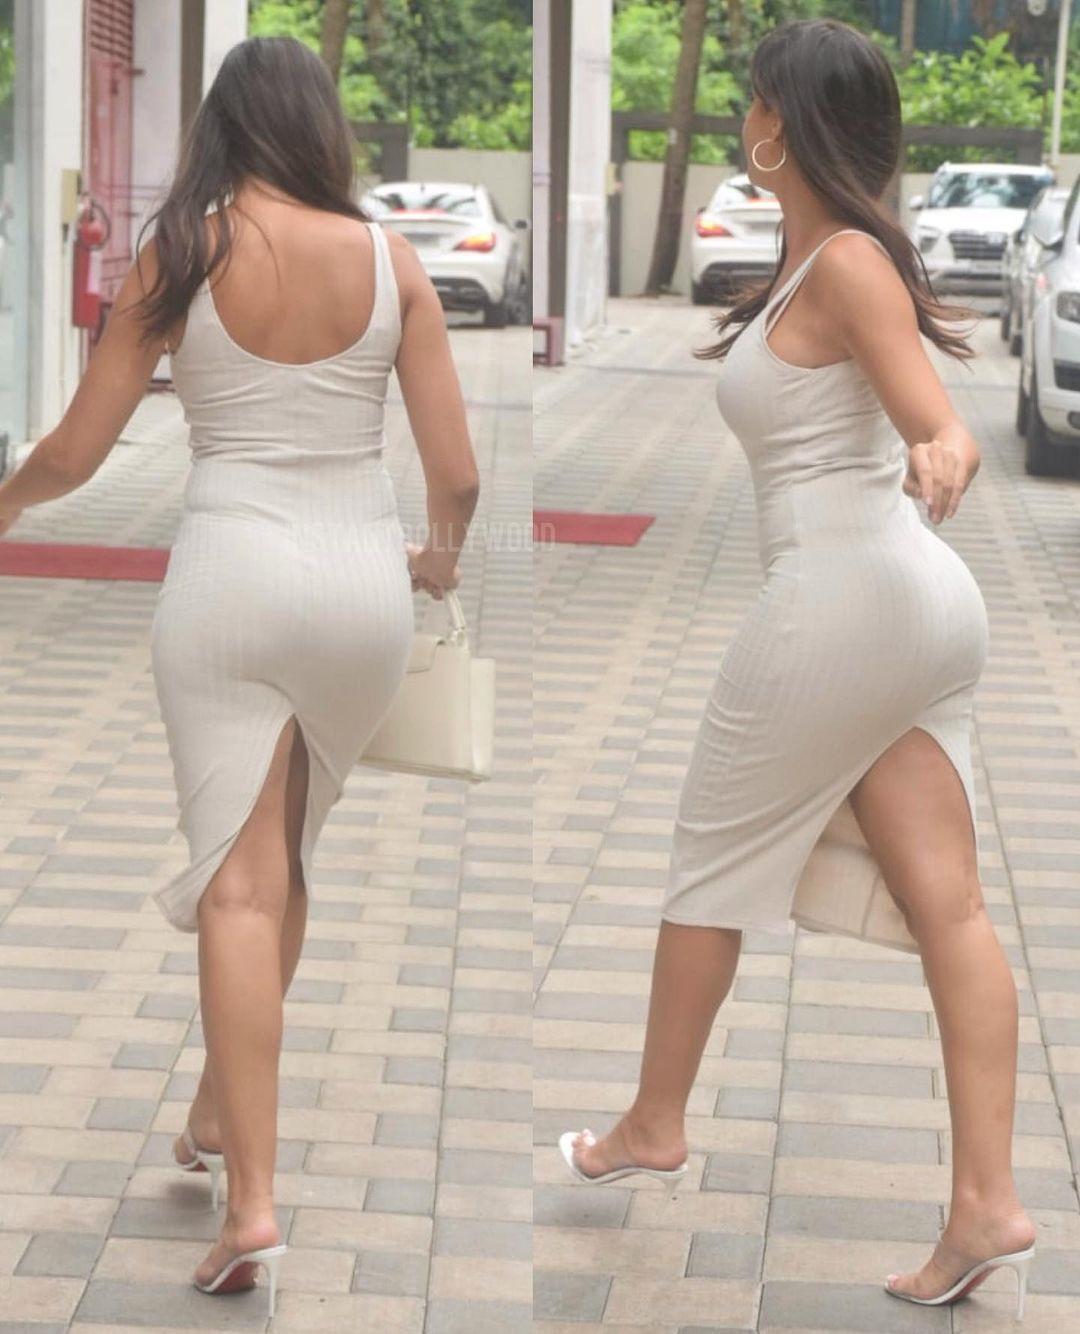 nora fatehi viral butt image